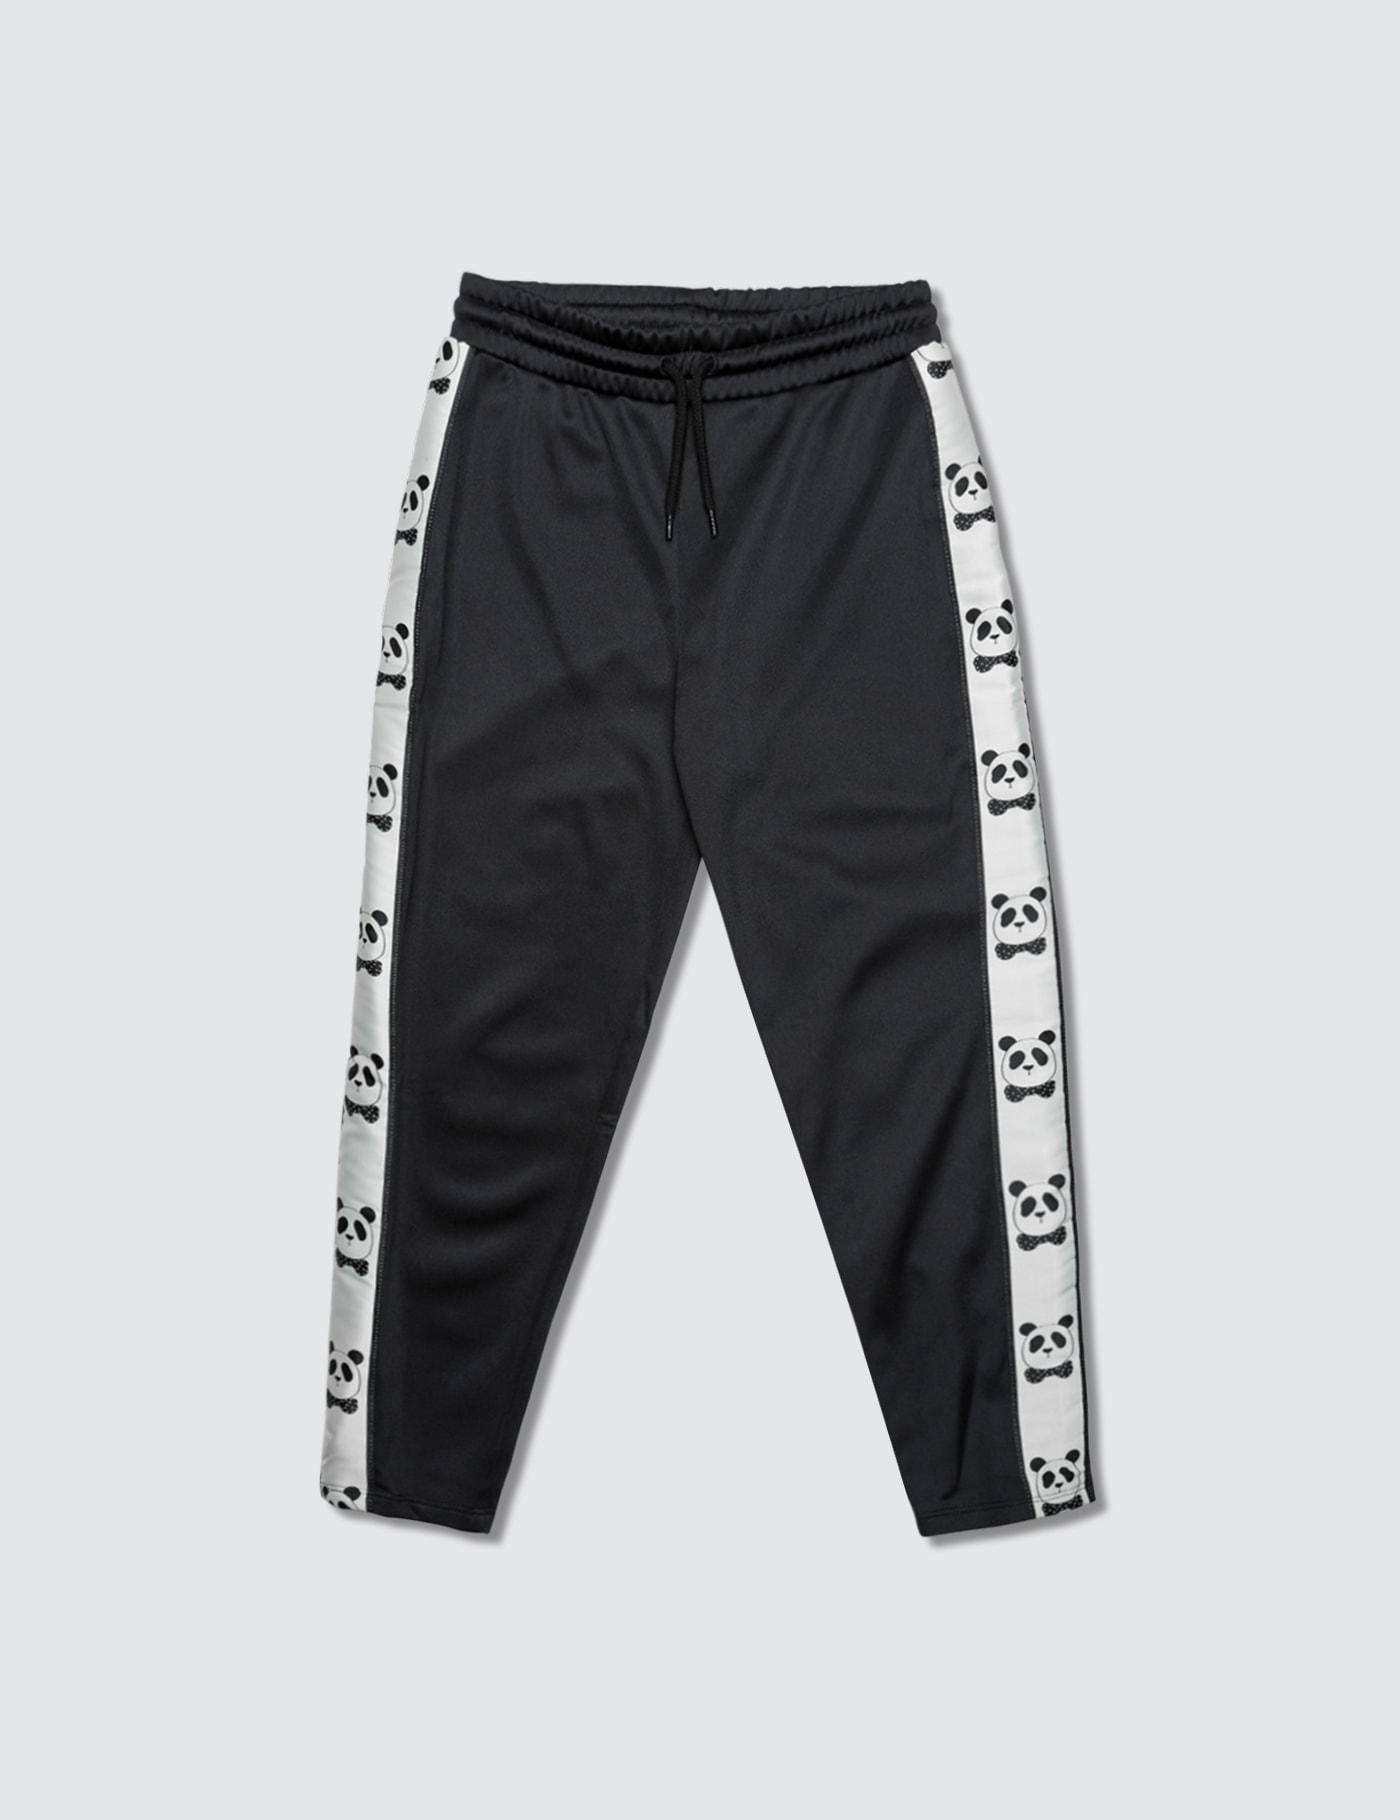 Panda Wct Pants